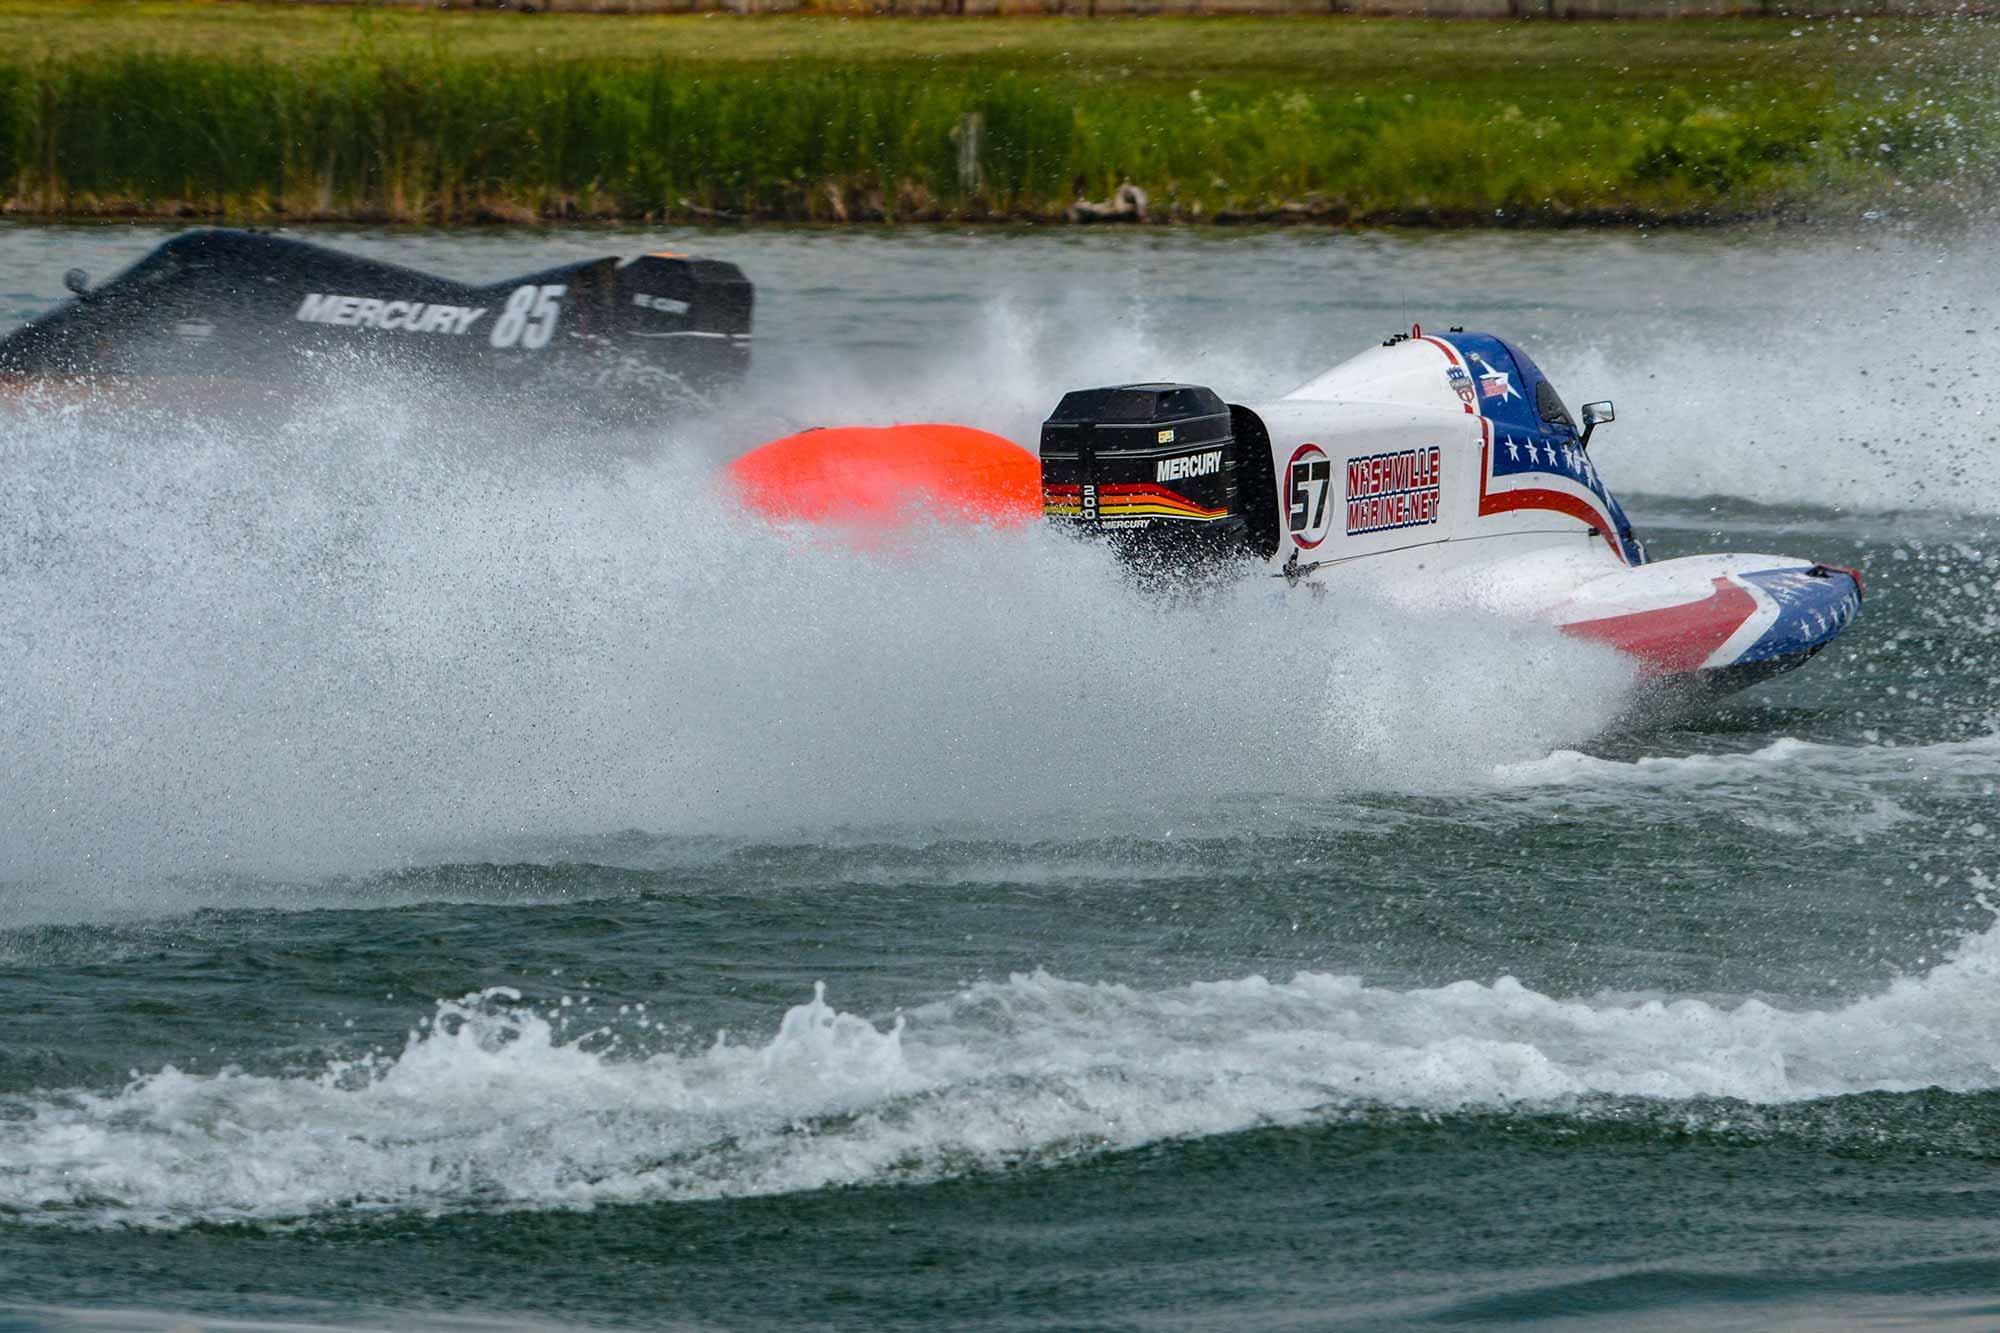 McMurray-Racing-Nashvill-Marine-2021-Springfield-F1-Race-49